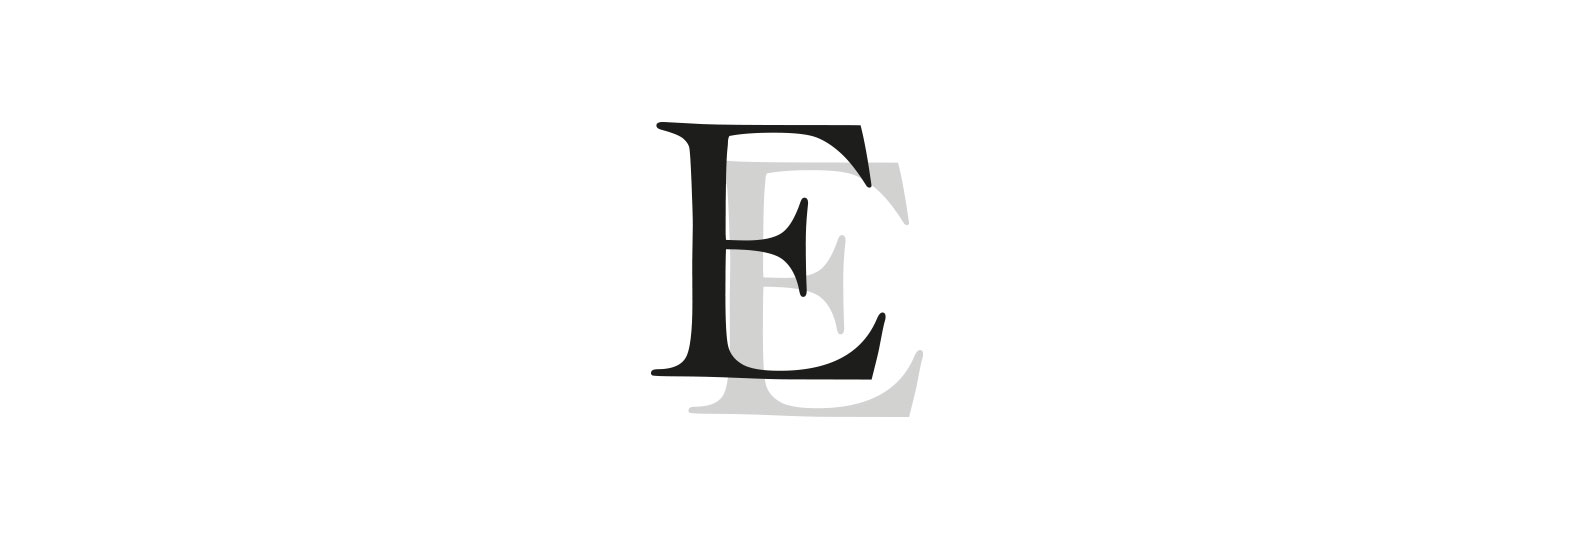 Das Schuhlexikon von Sioux Buchstabe E